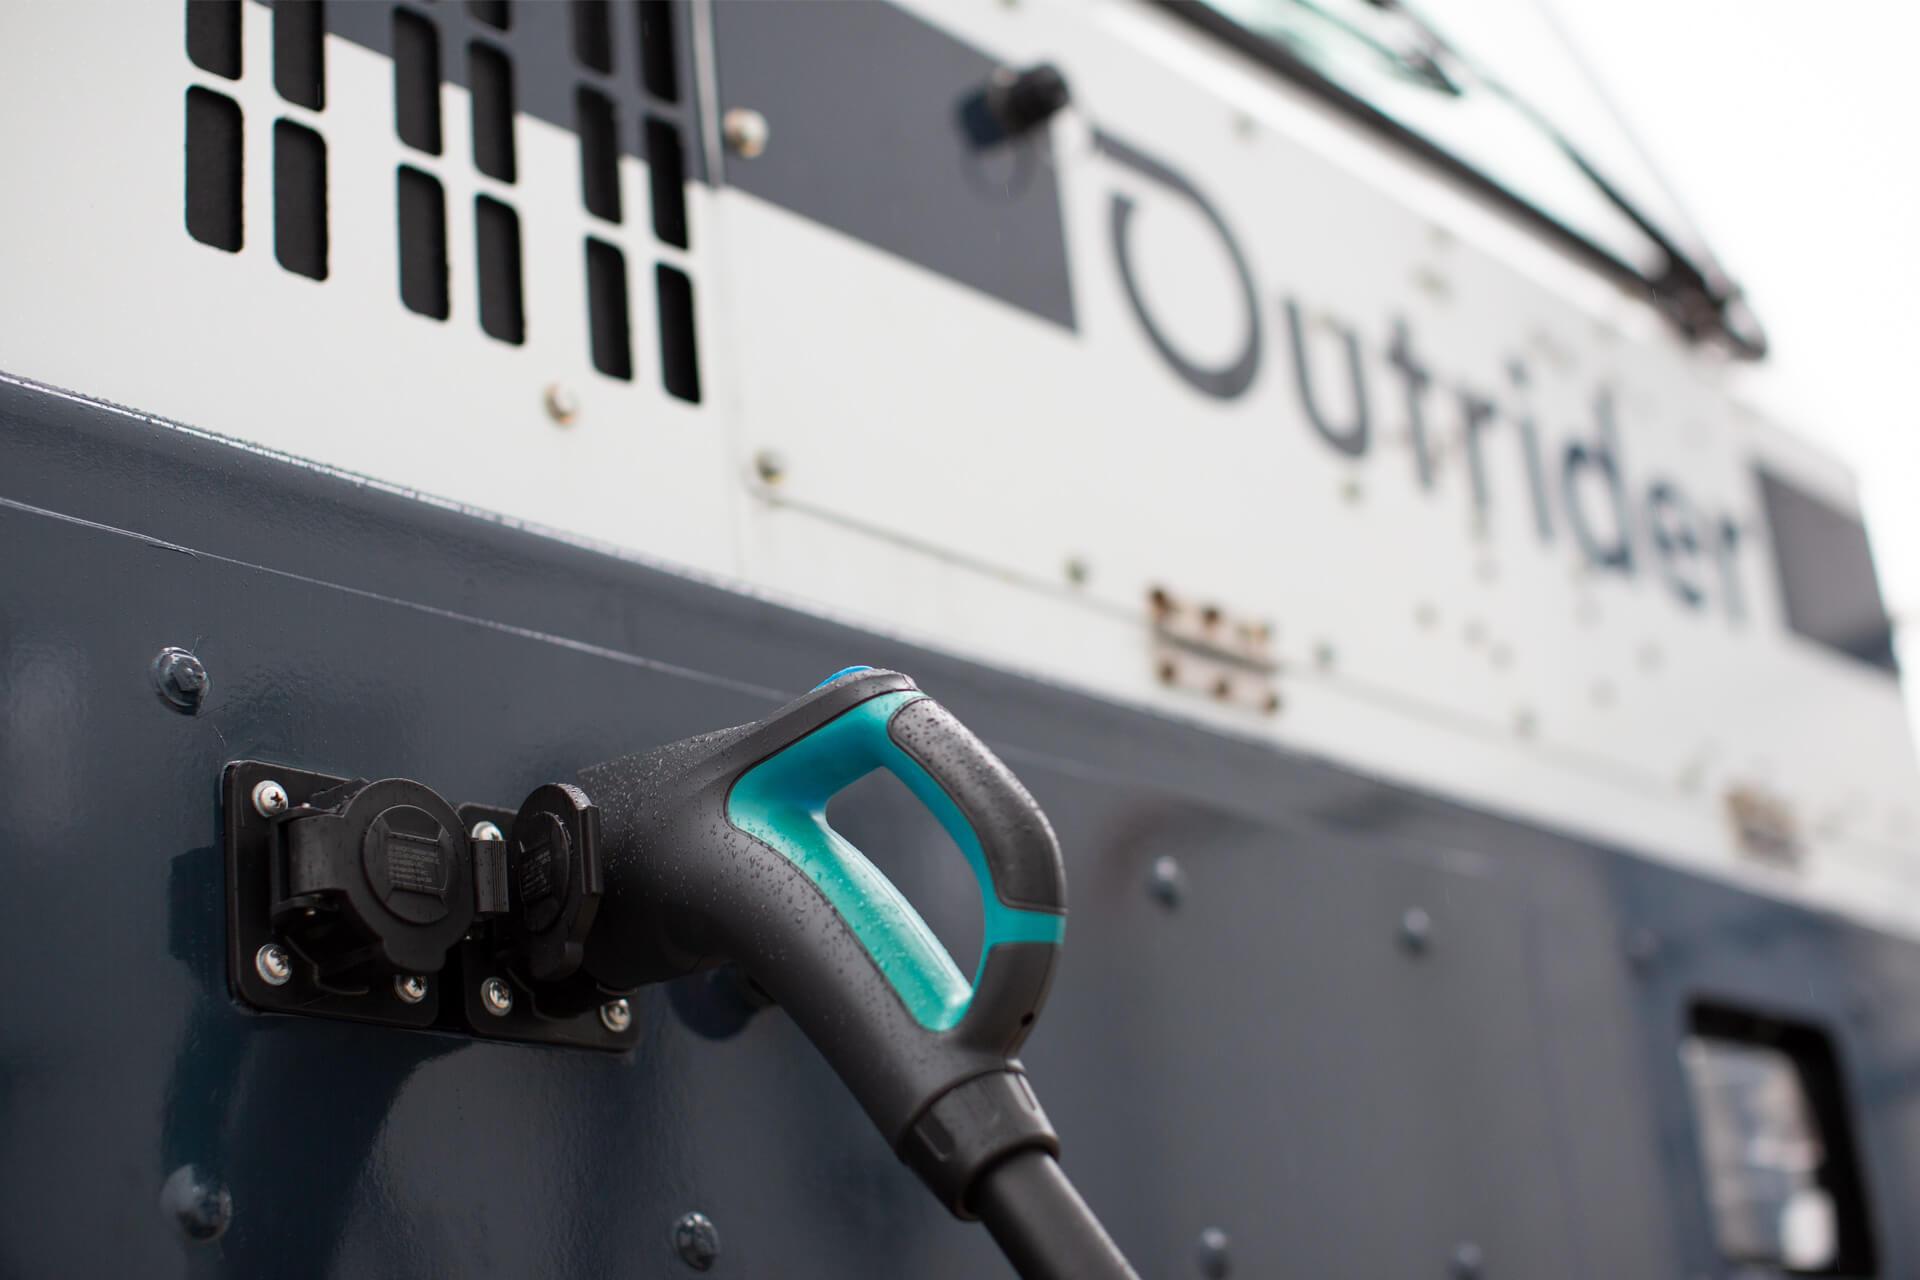 Outrider raises $65 million to bring its autonomous tech to distribution yards – TechCrunch